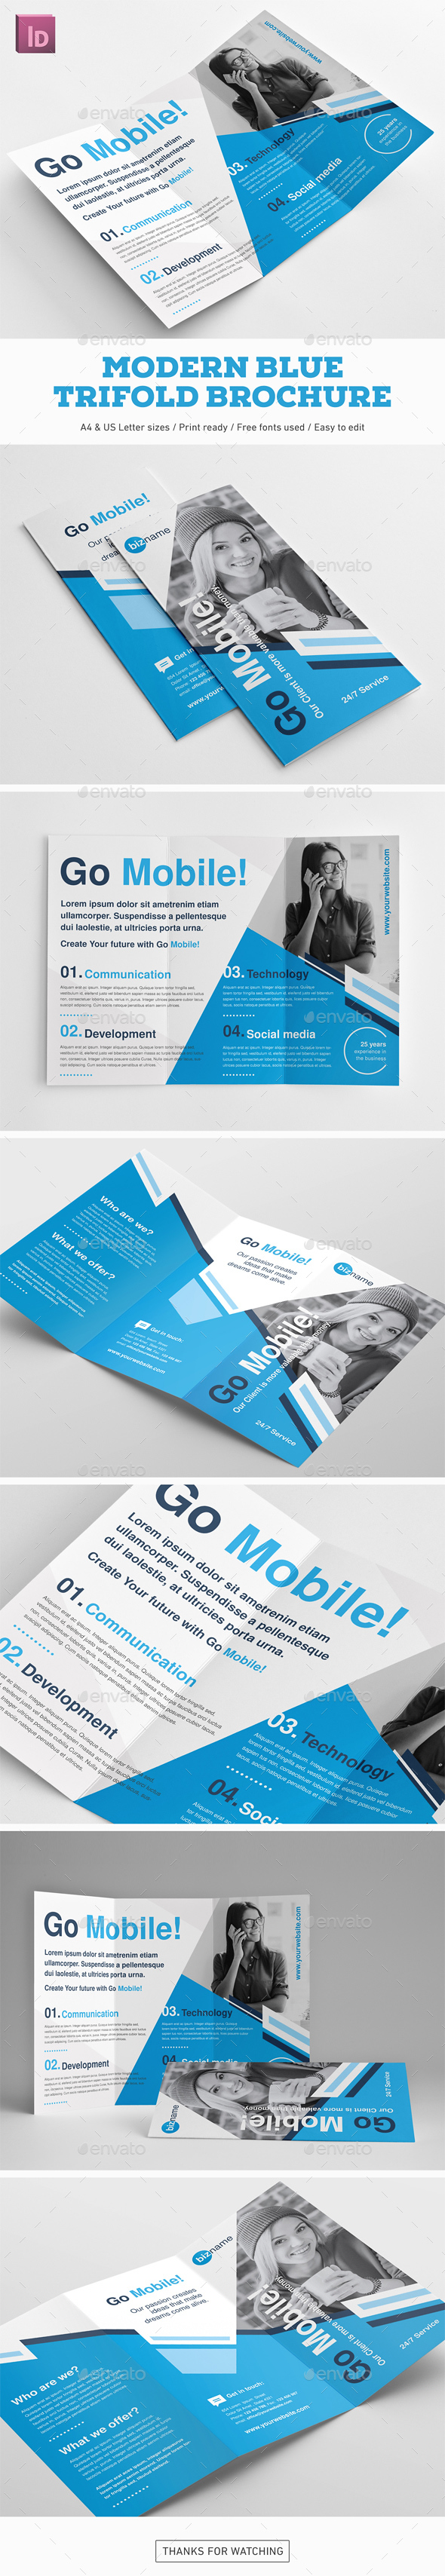 Modern Blue Trifold Brochure - Corporate Brochures